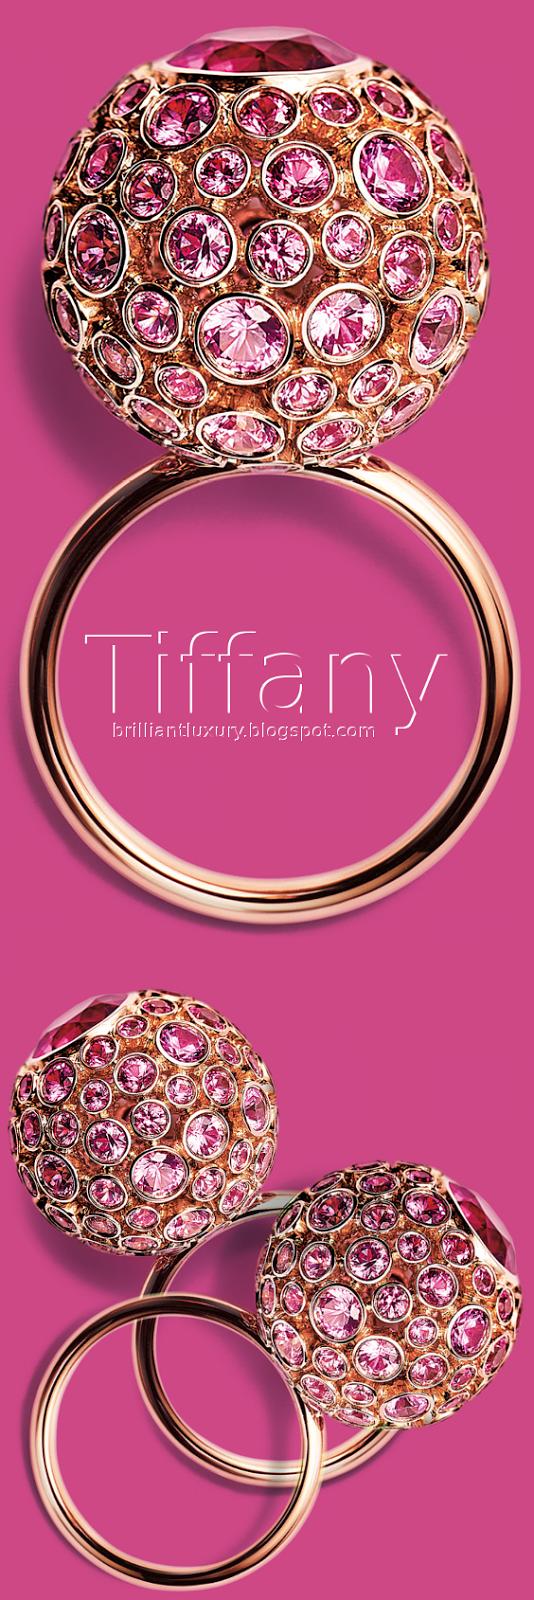 Brilliant Luxury ♦ Tiffany prison orb ring